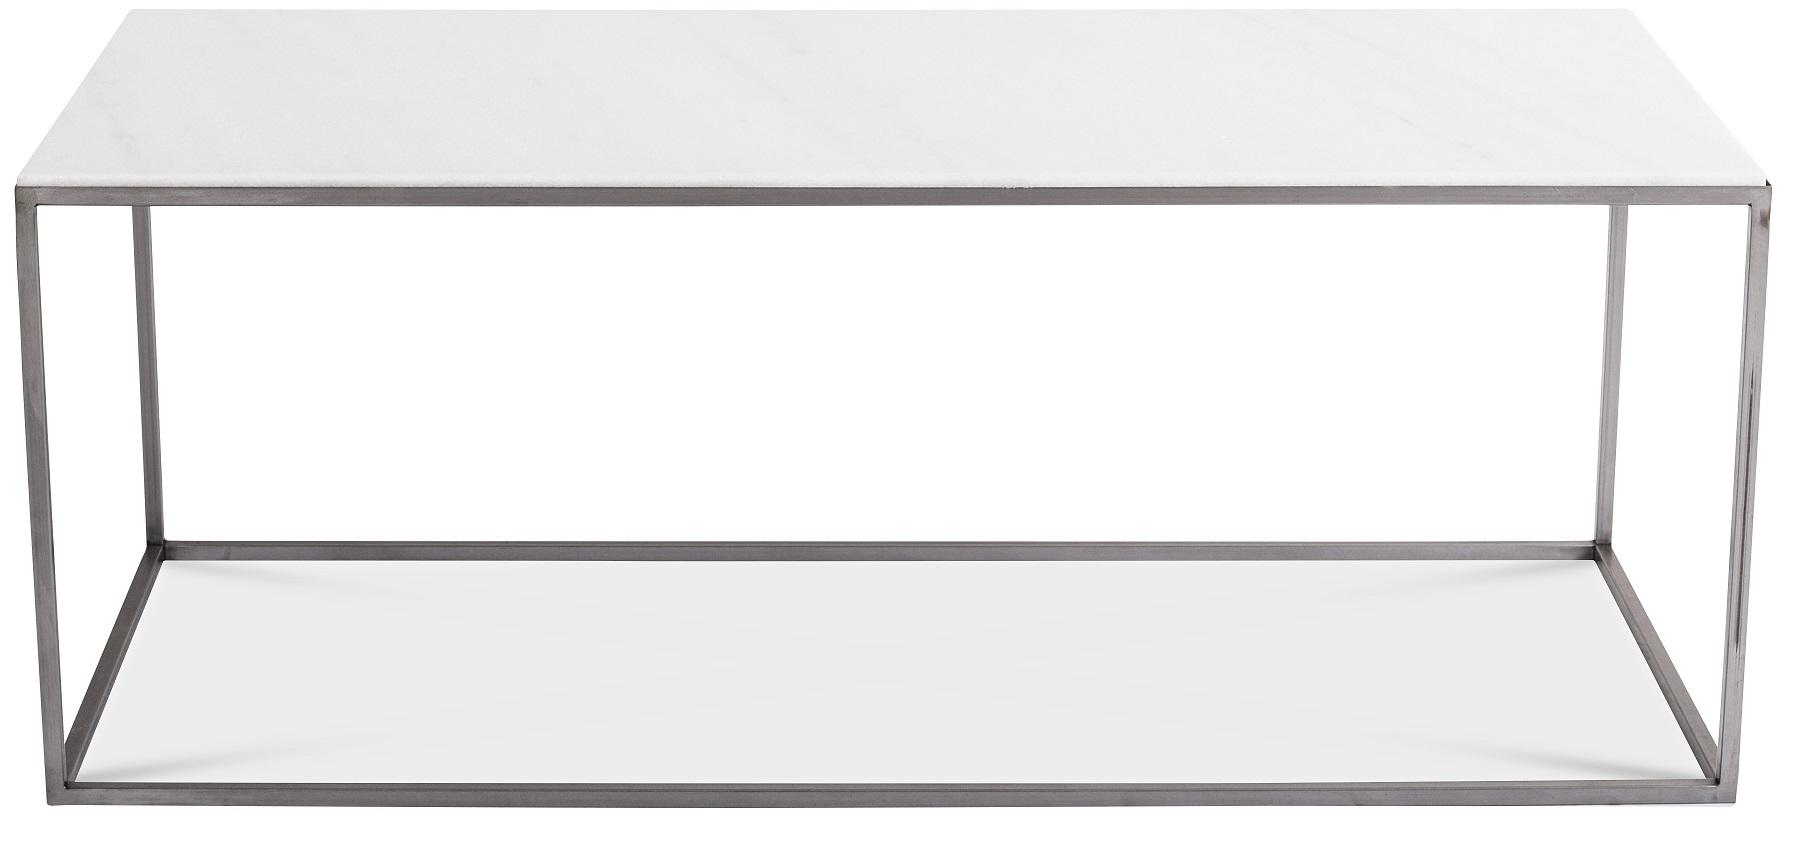 Carrera soffbord 125 cm Vit Marmor Stål 3695 kr Trendrum se